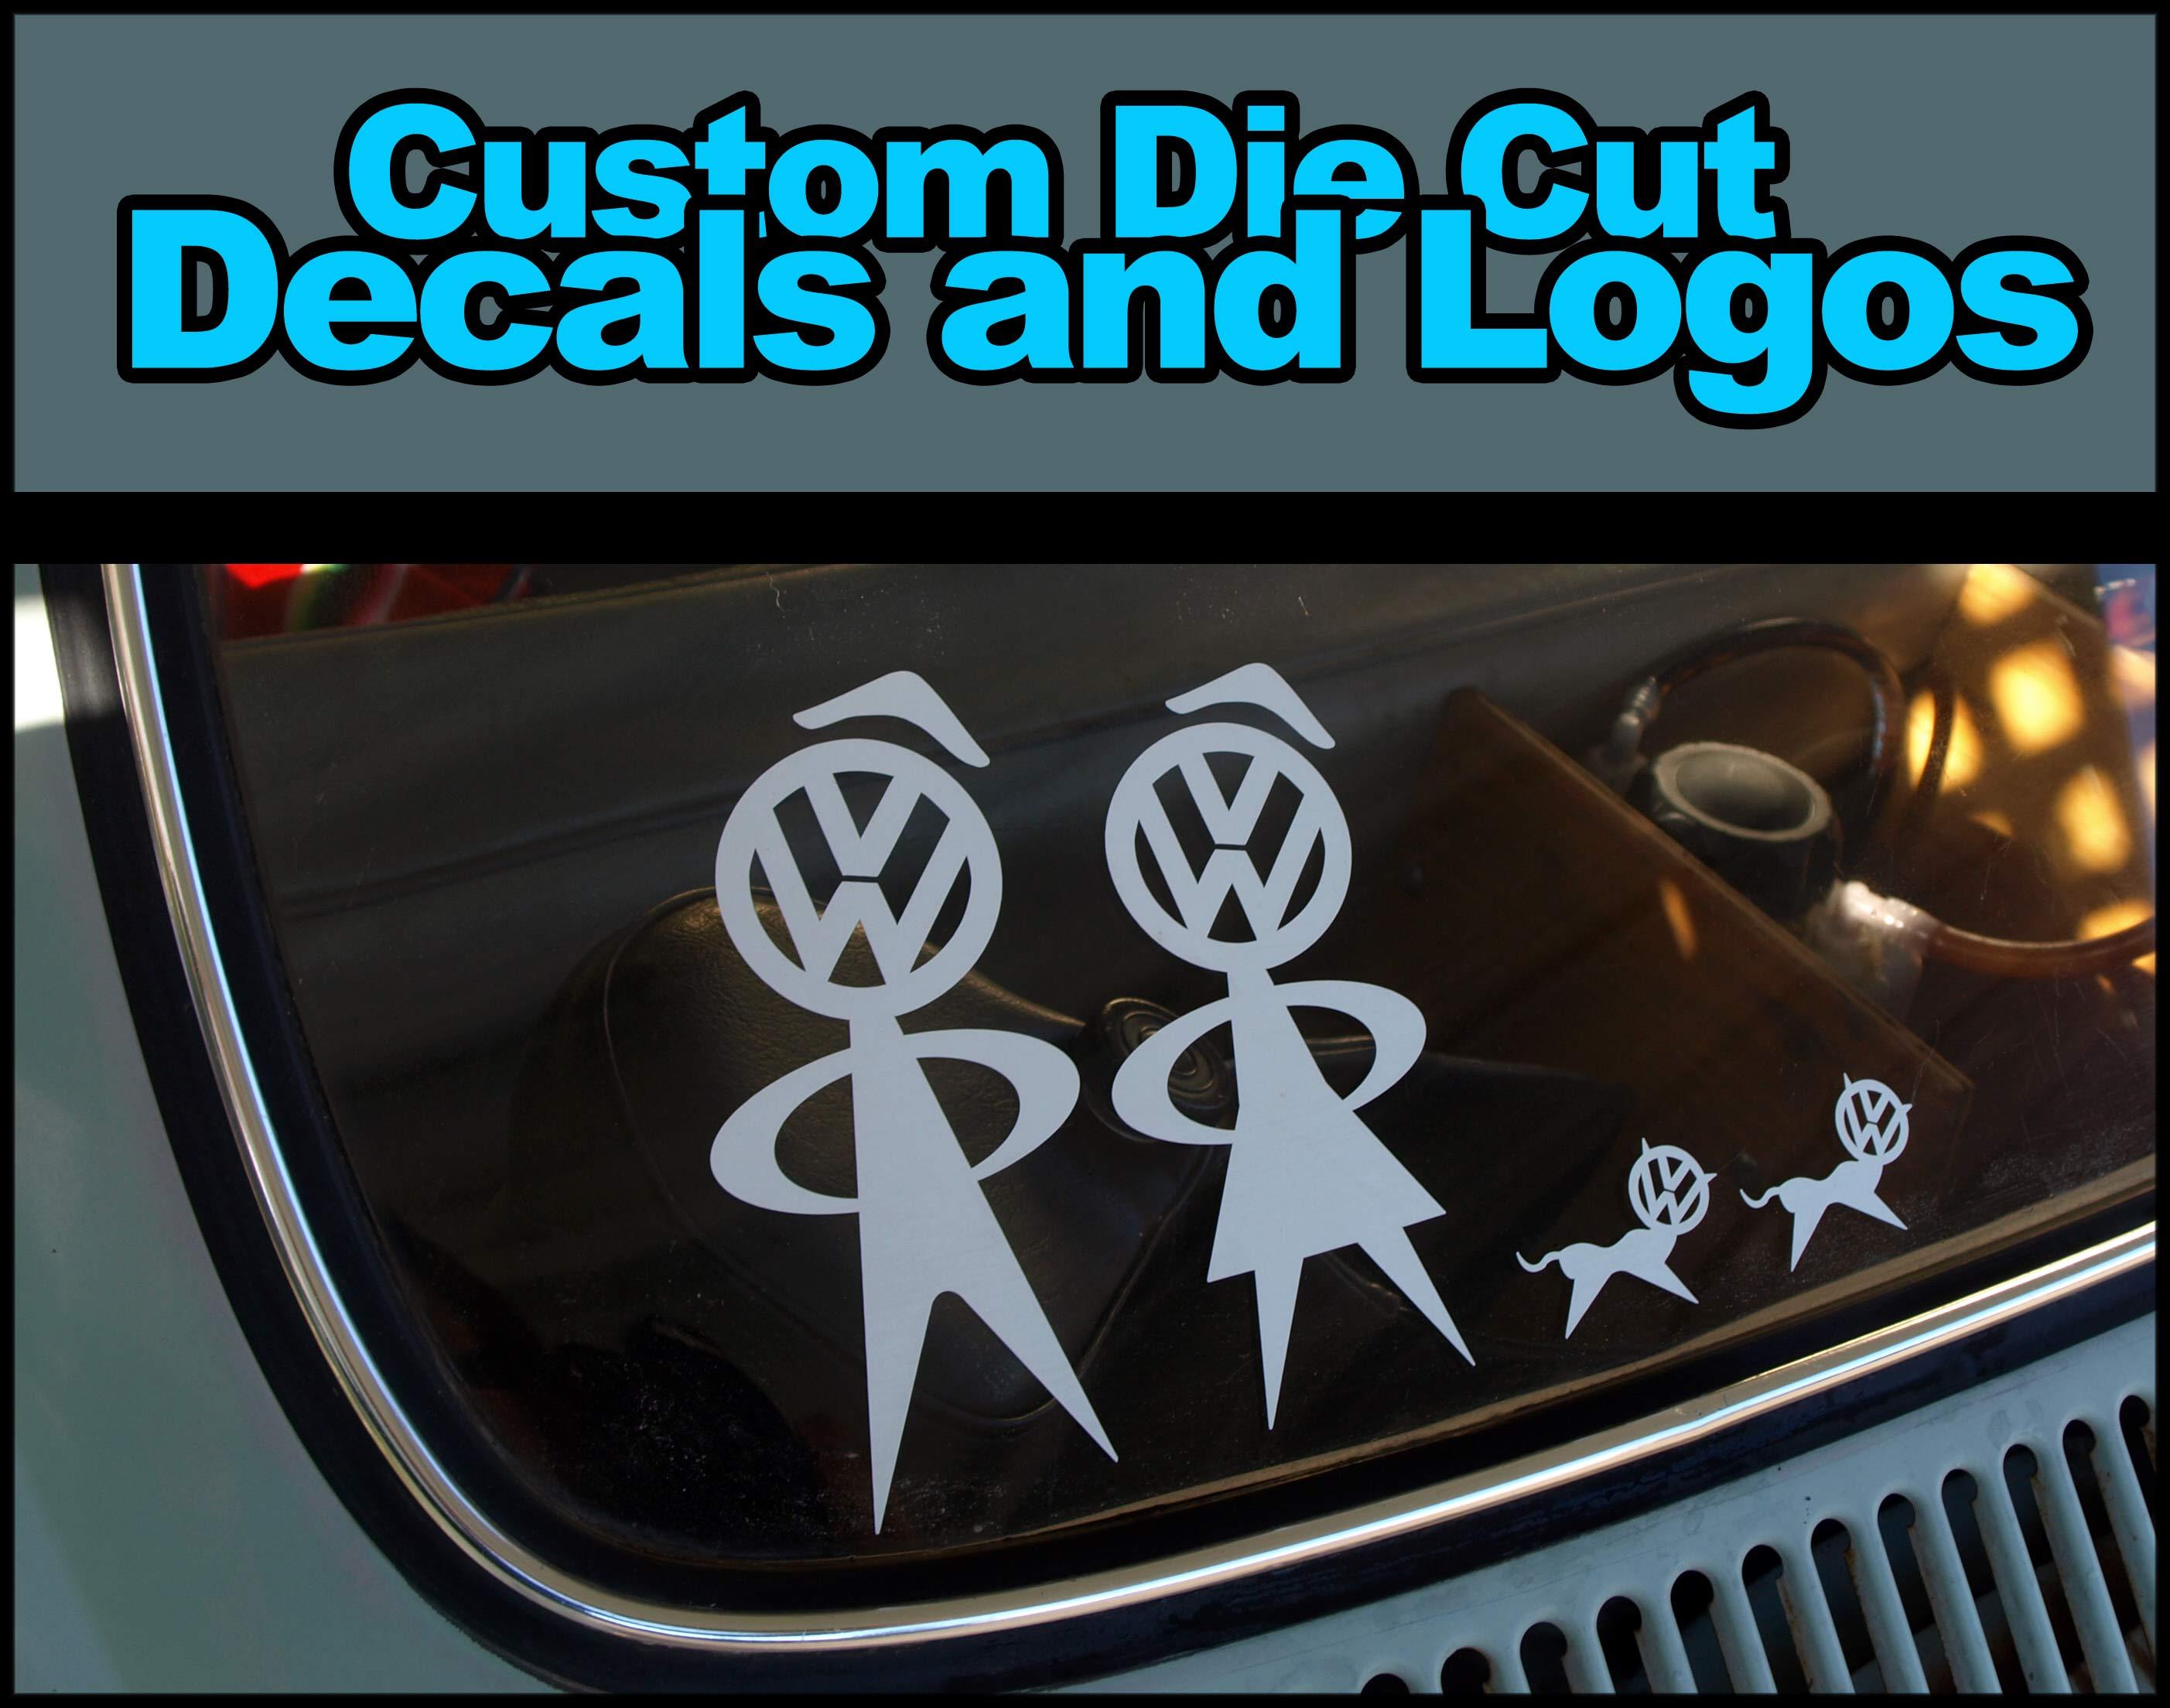 Personalized custom die cut vinyl decals and logos 6